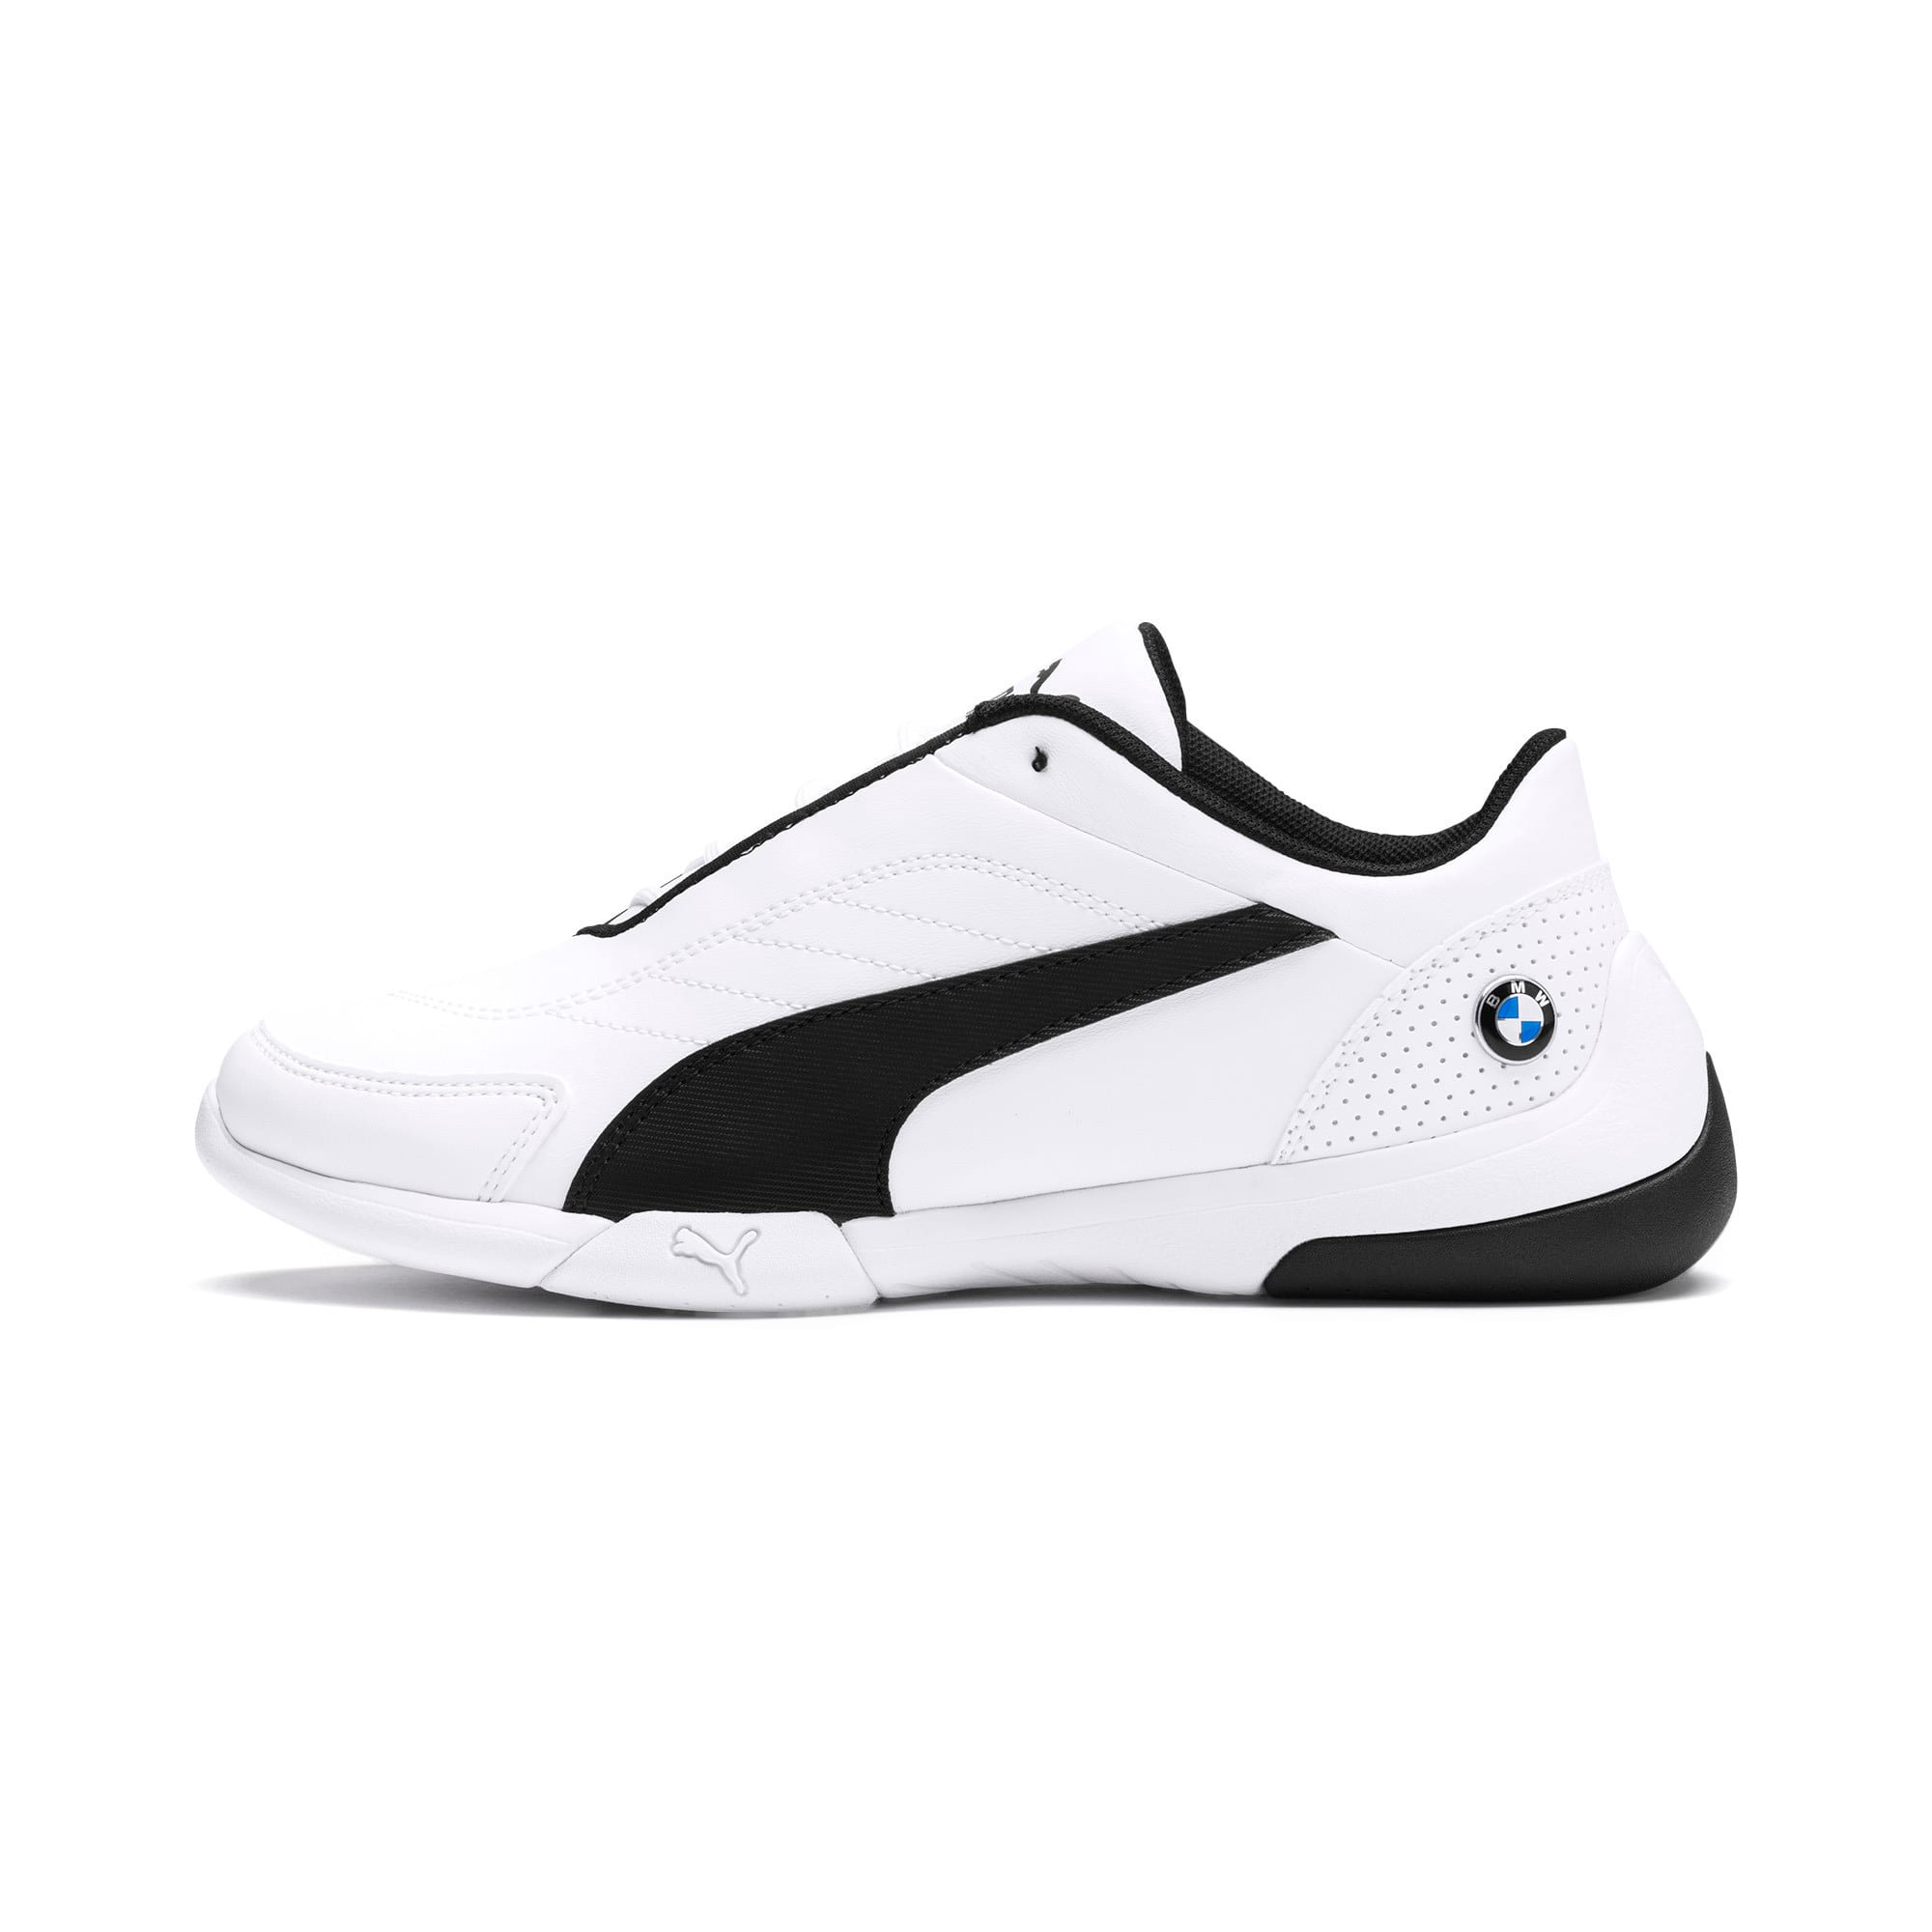 Thumbnail 1 of BMW MMS Kart Cat III Shoes JR, Puma White-Puma Black, medium